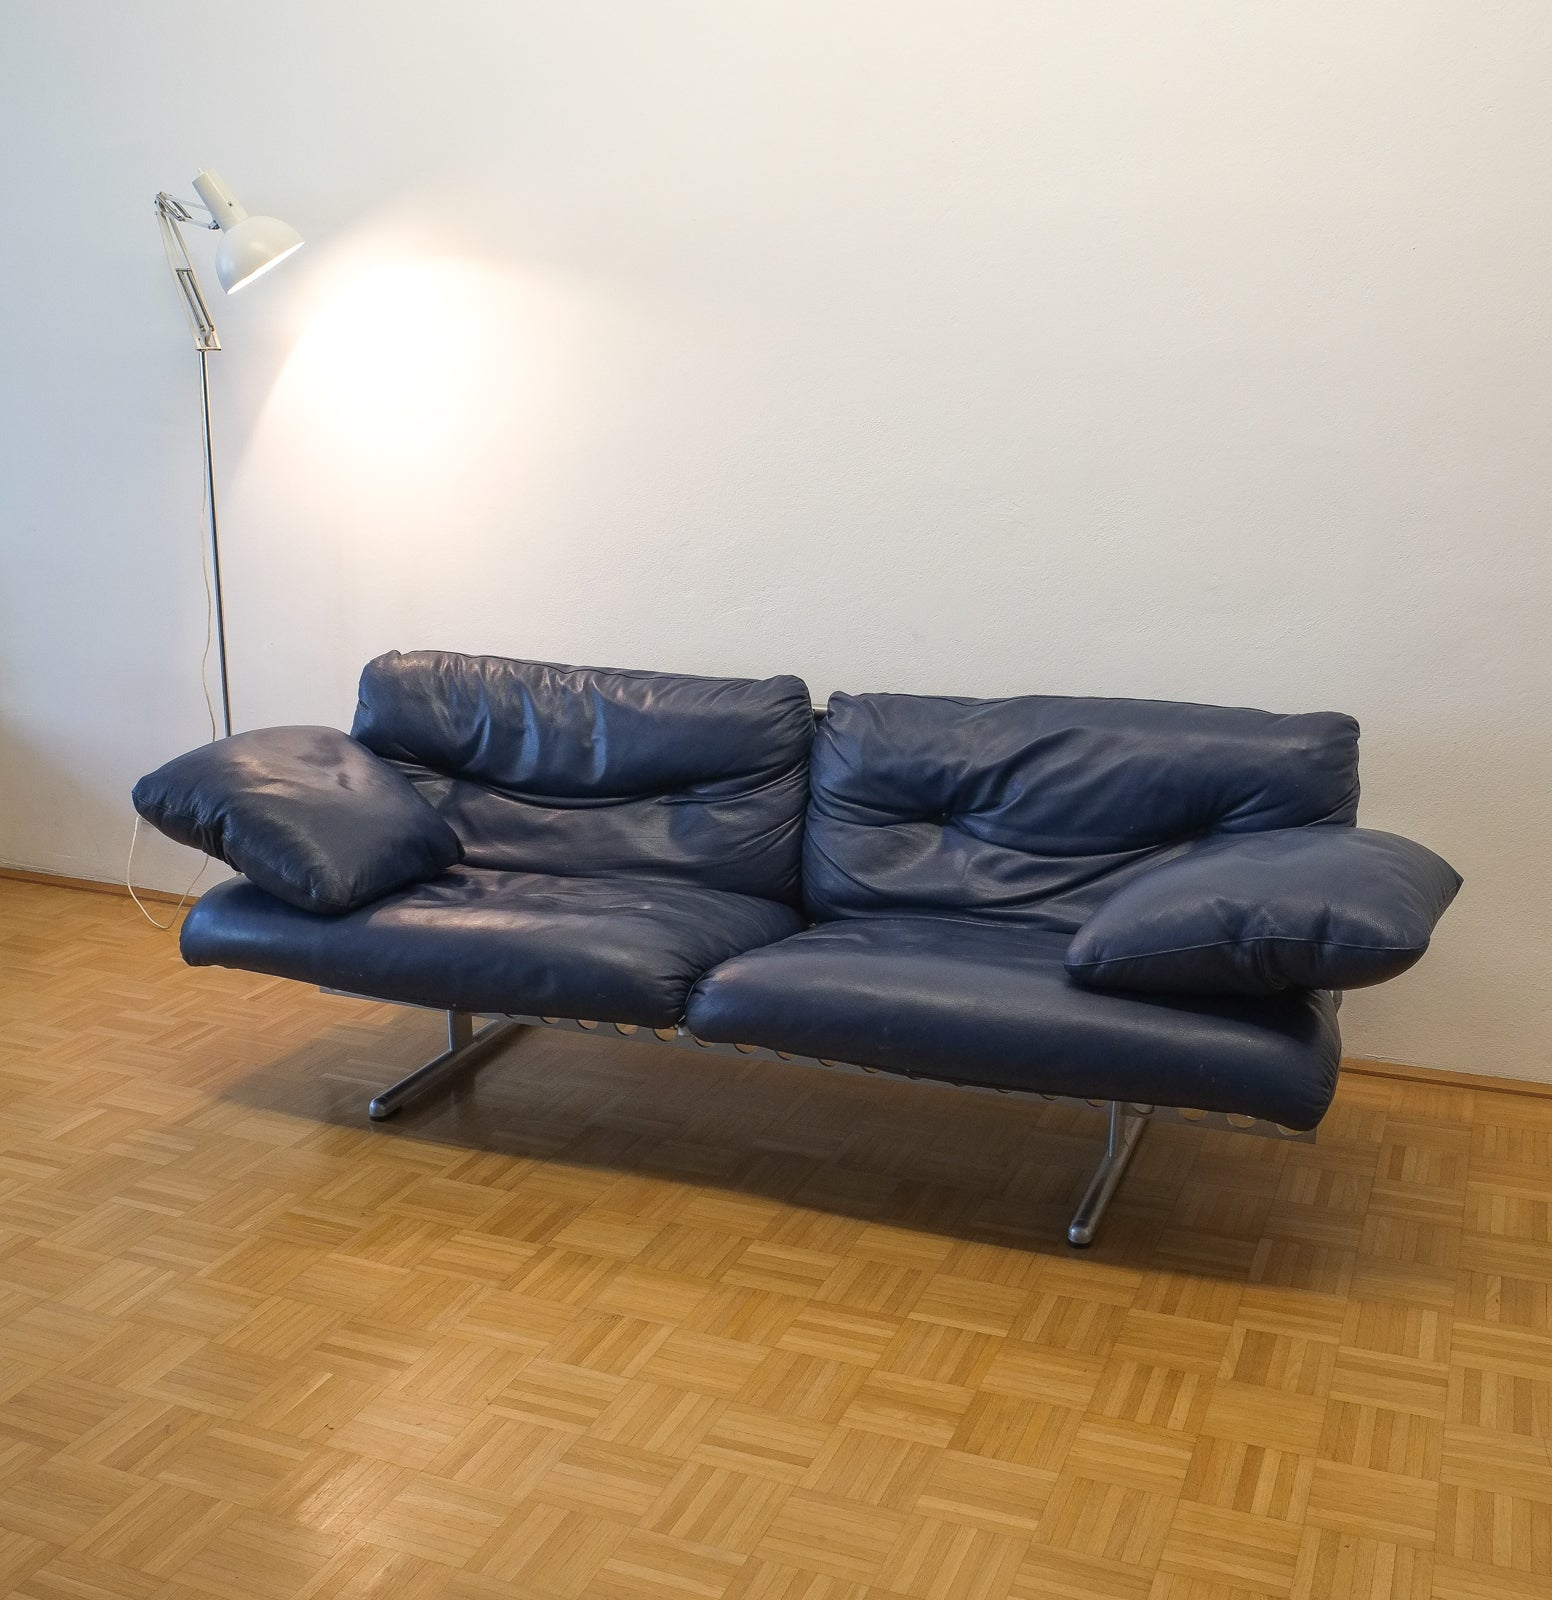 Pierluigi Cerri Ouverture Leather Sofa for Poltrona Frau, Italy ...